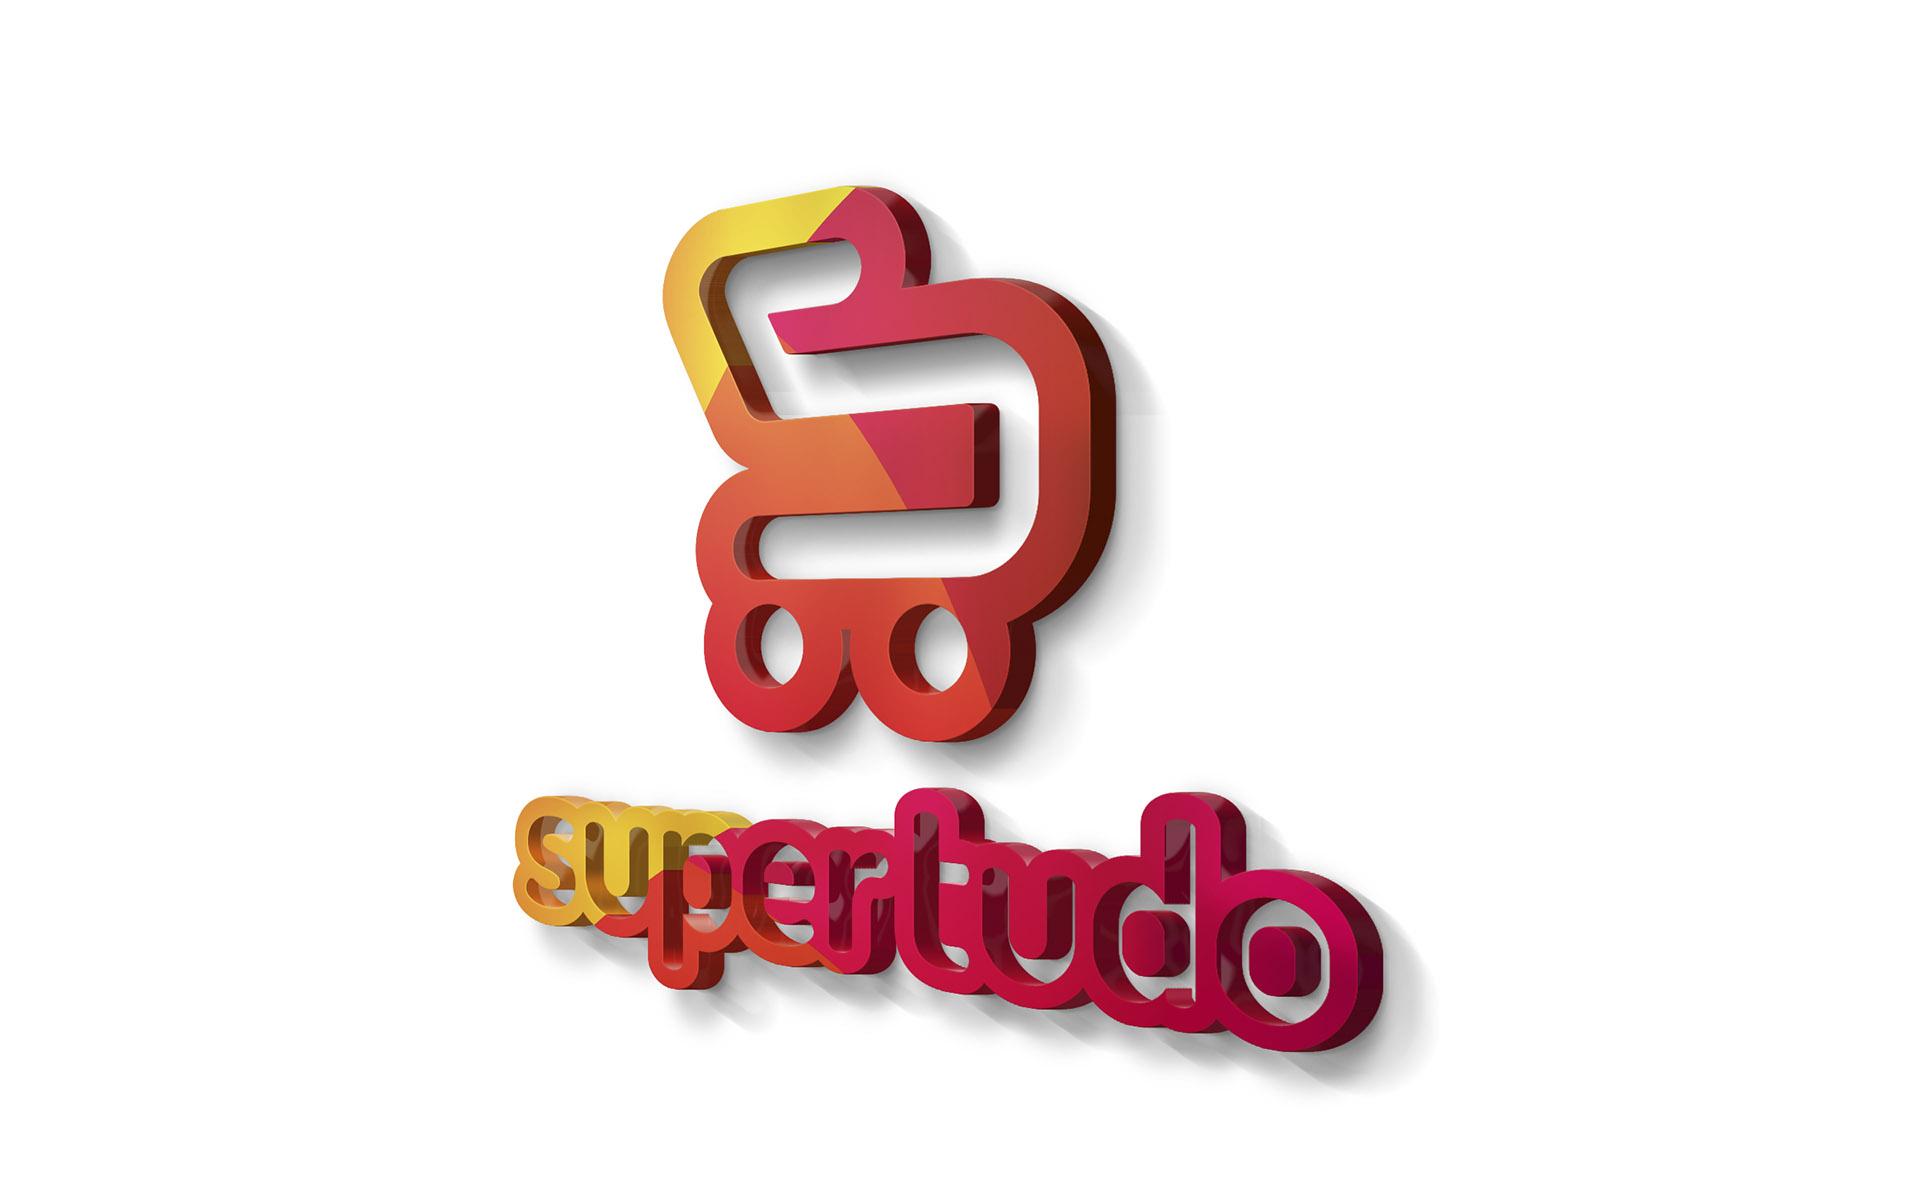 SuperTudo